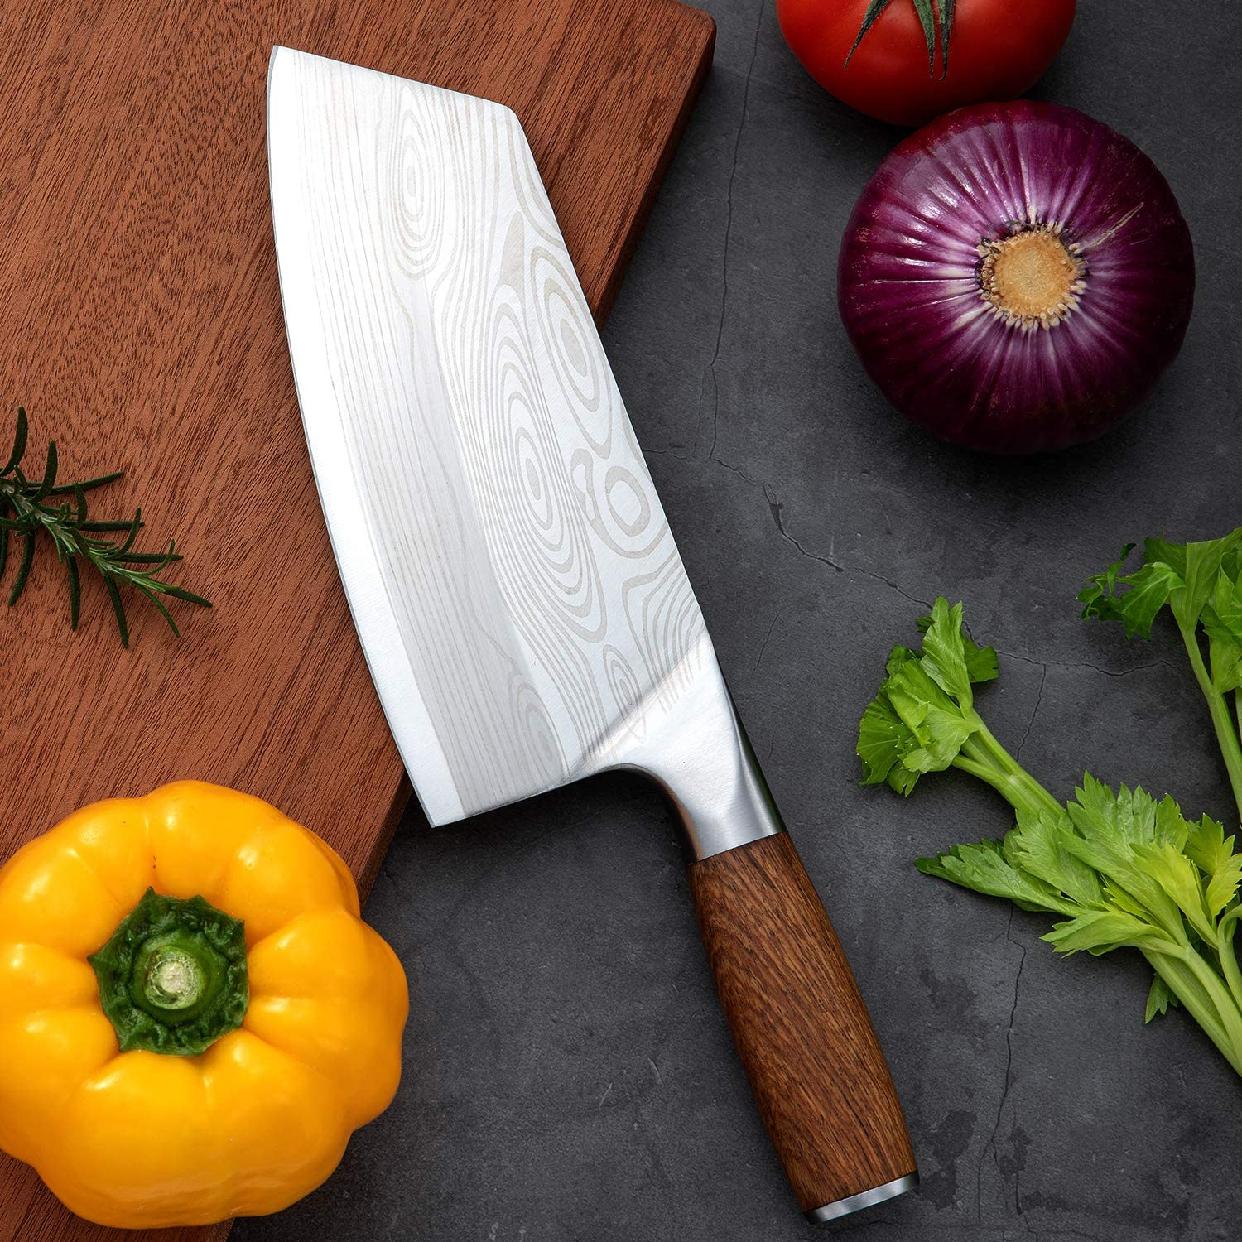 MUKAI(ムカイ) ステンレス キッチンナイフ 20cmの商品画像9